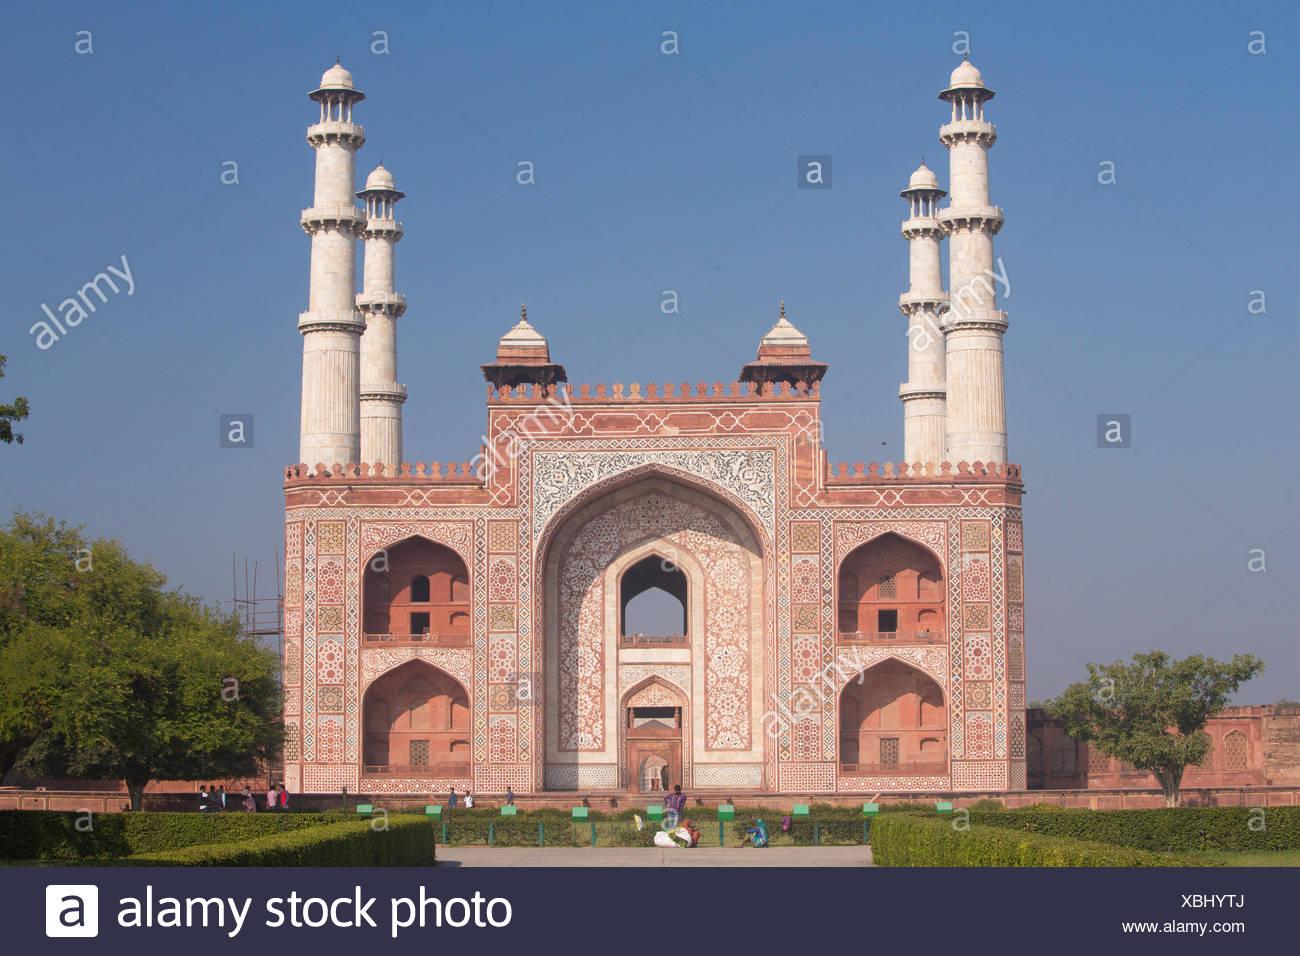 Tomb, Sikandra, Agra, Uttar Pradesh, towers, religion, Asia, - Stock Image